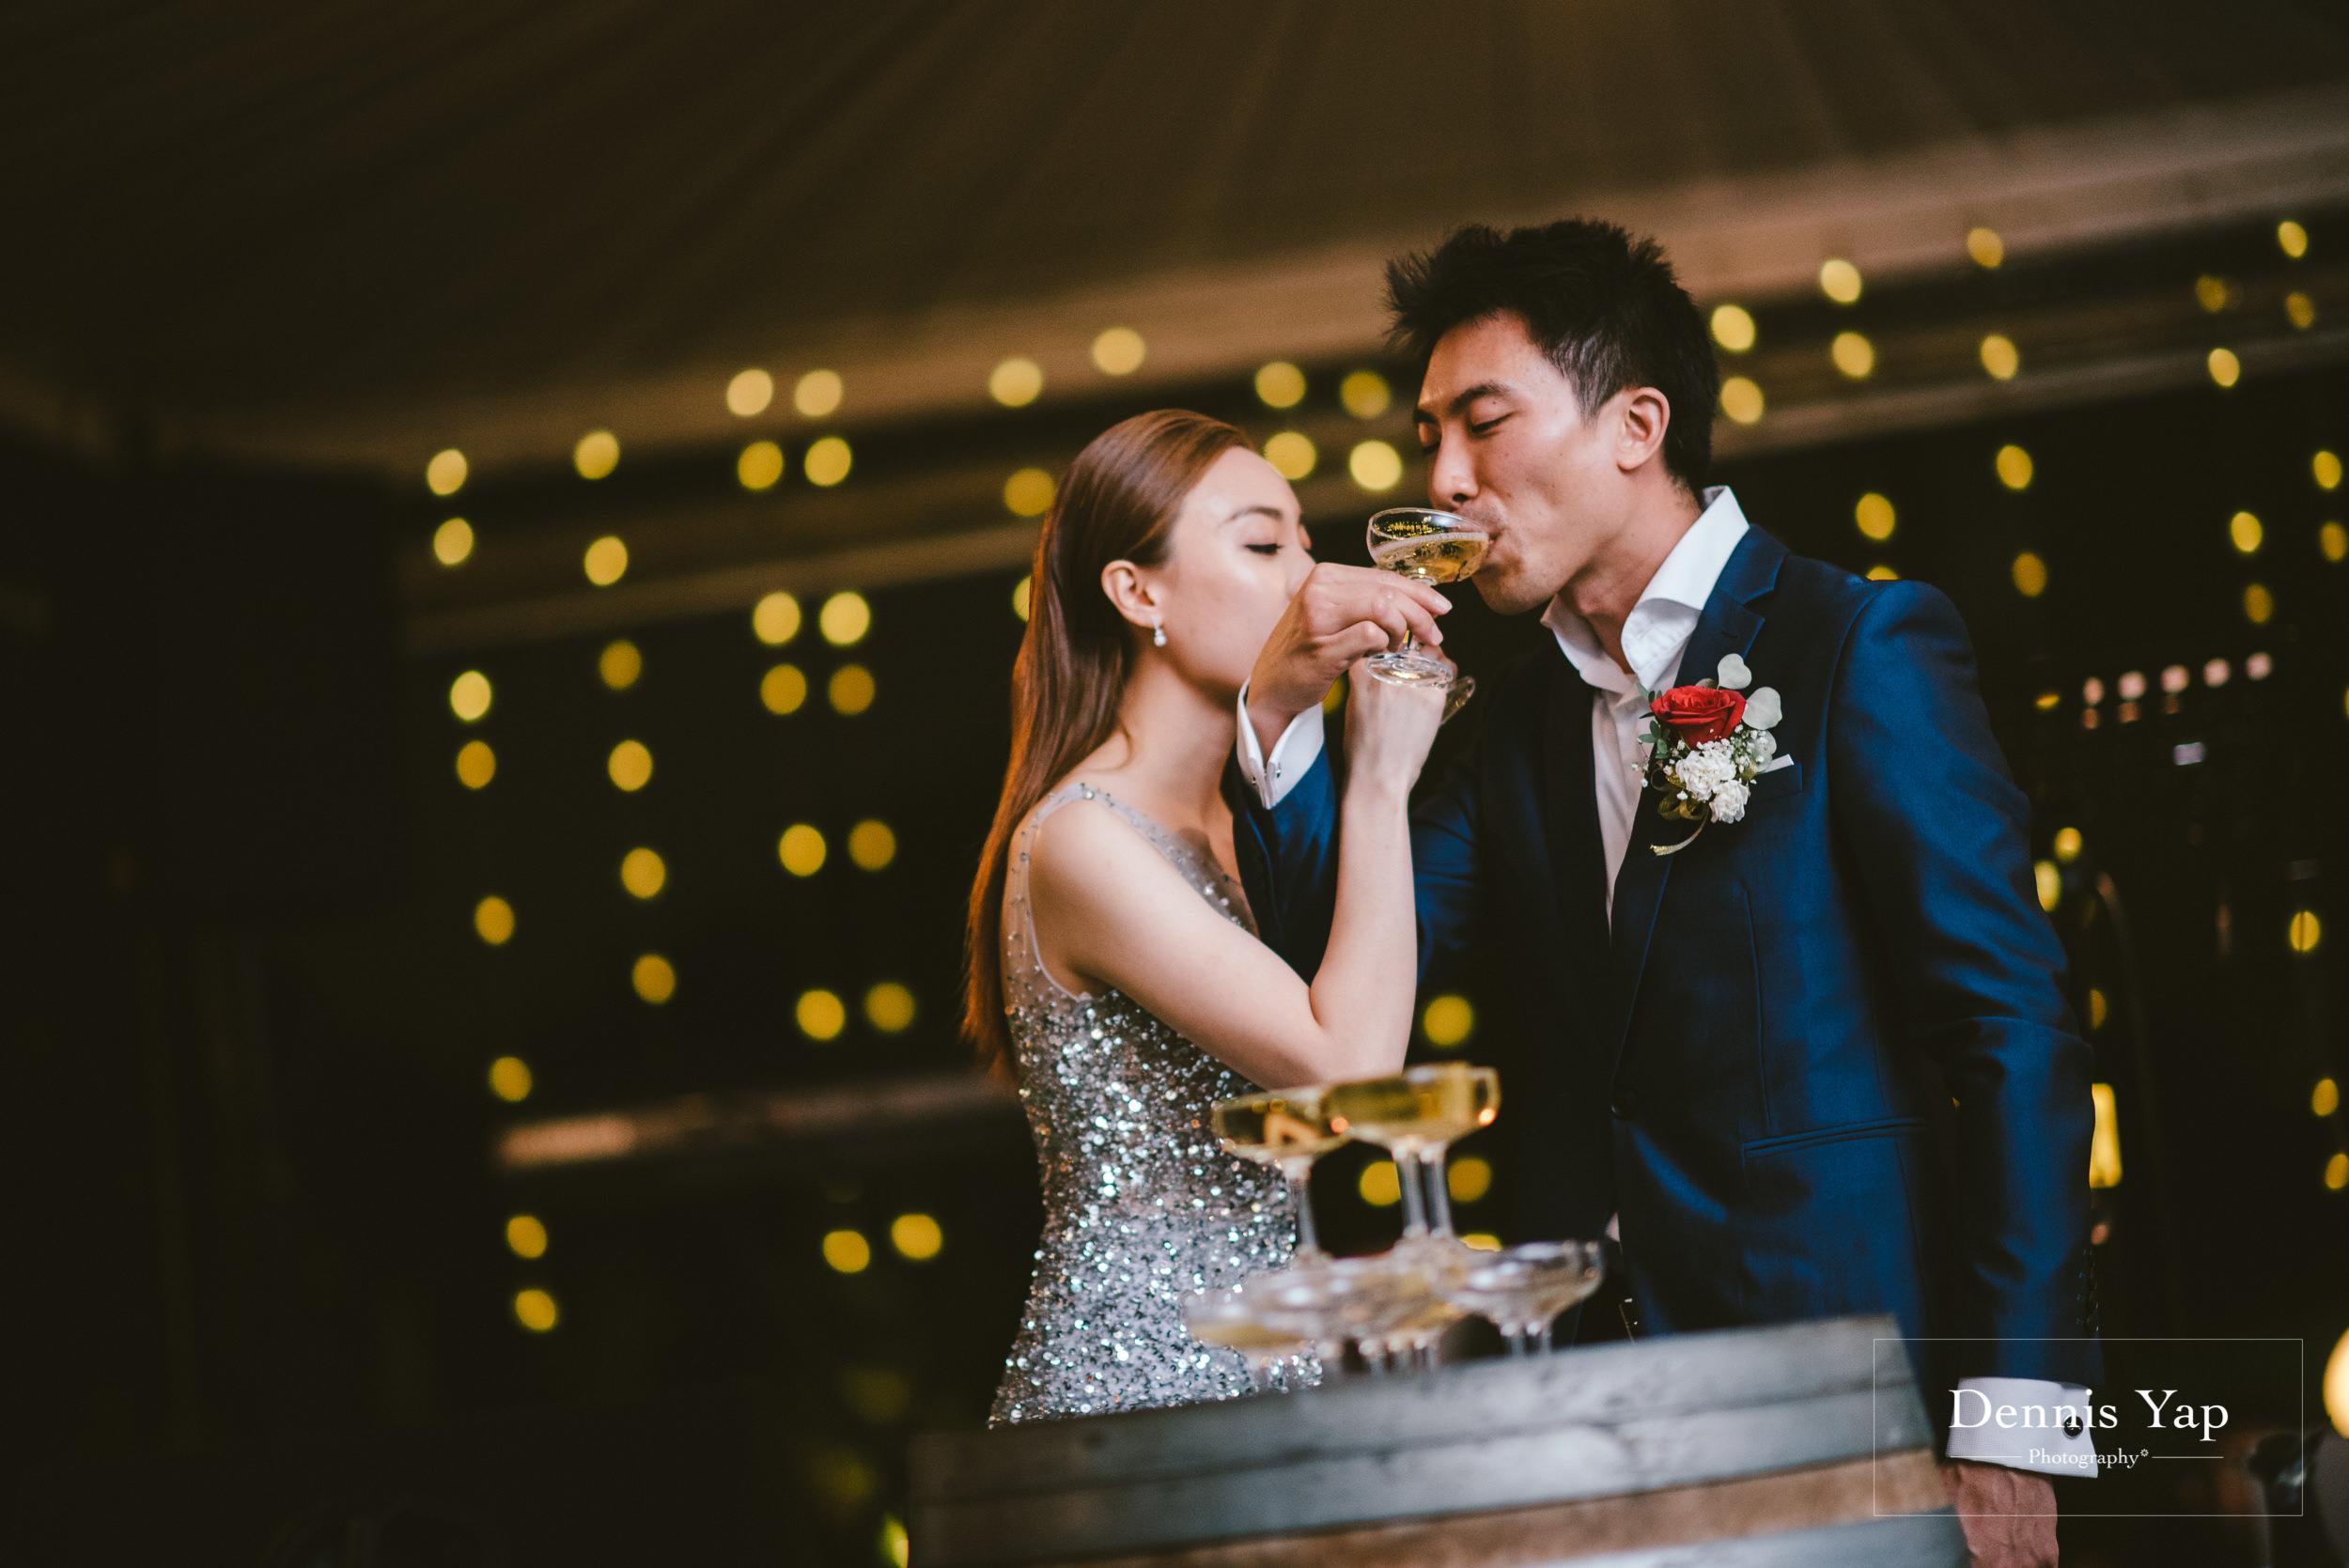 justin hsin wedding day ciao ristorante kuala lumpur dennis yap photography-38.jpg